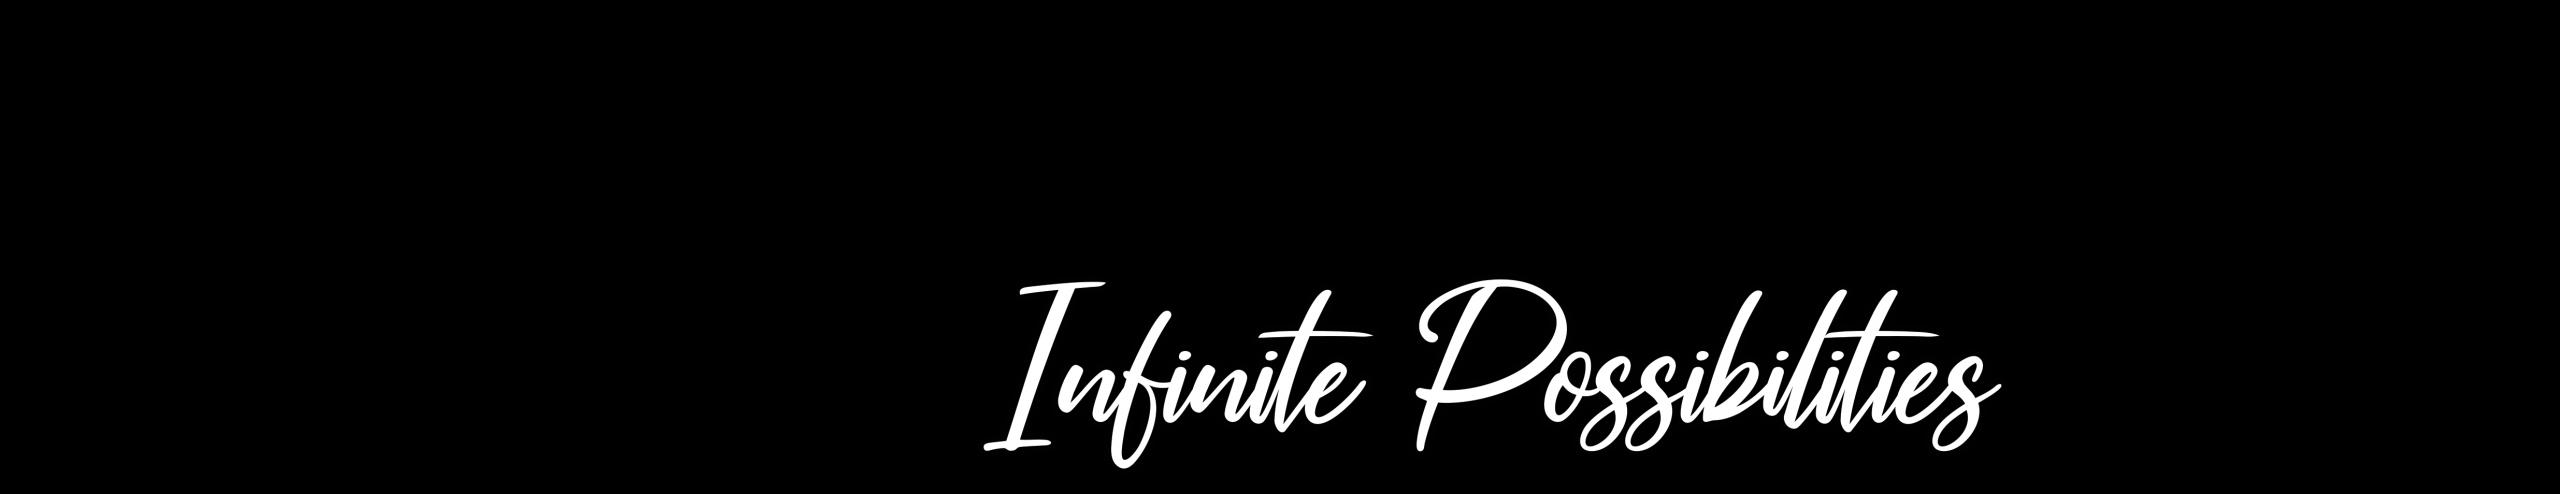 Tojeezo is Infinite Possibilities